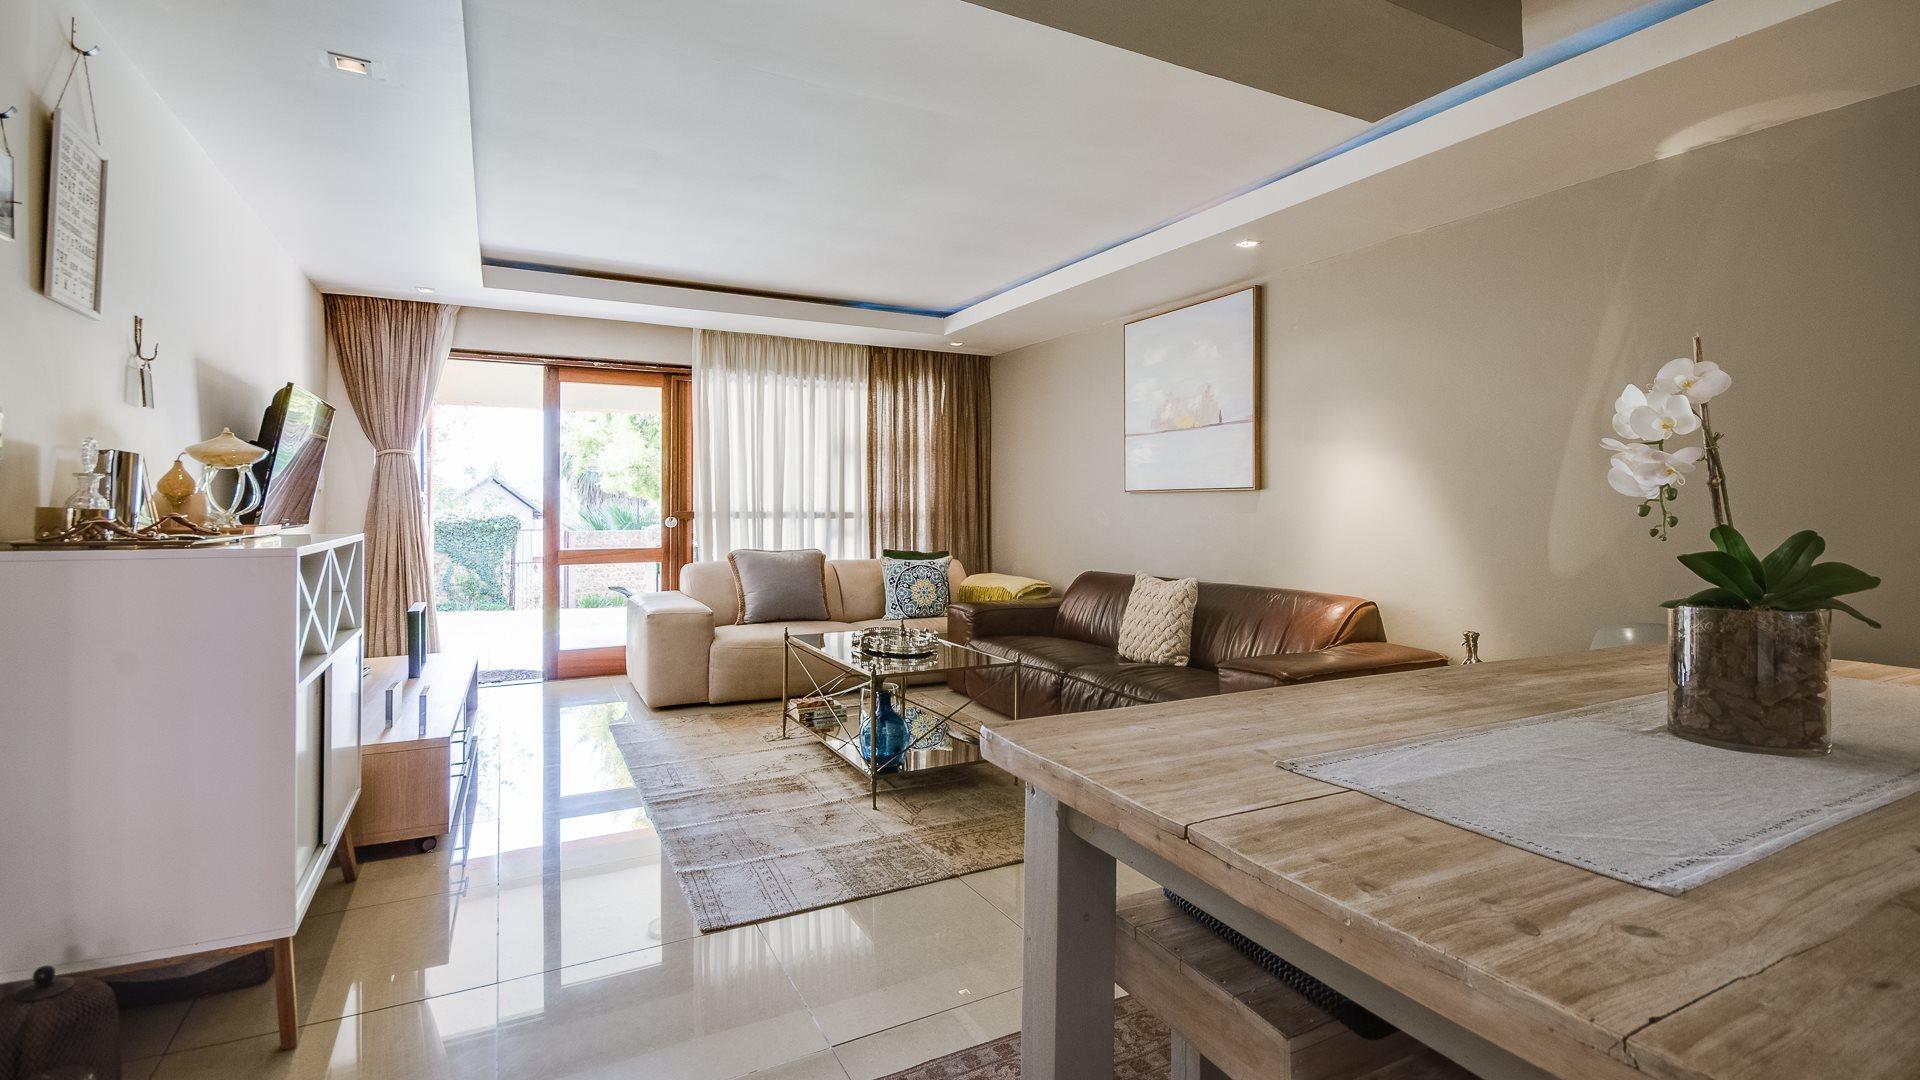 Johannesburg, Corlett Gardens Property  | Houses For Sale Corlett Gardens, Corlett Gardens, Apartment 2 bedrooms property for sale Price:1,050,000